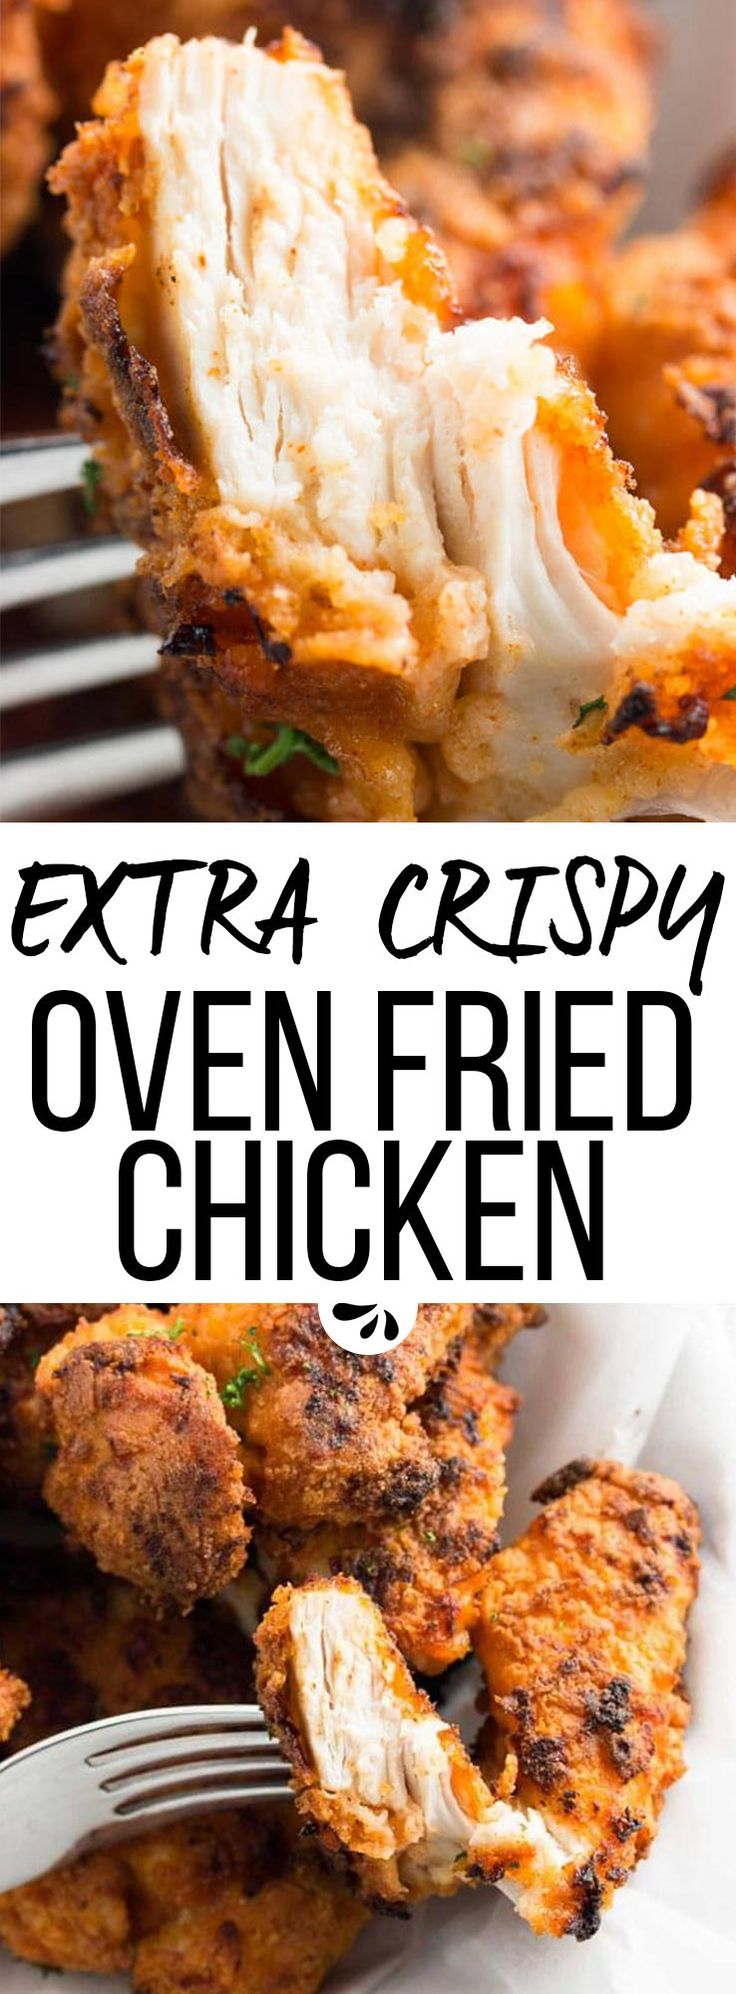 Frying skinless chicken breast something